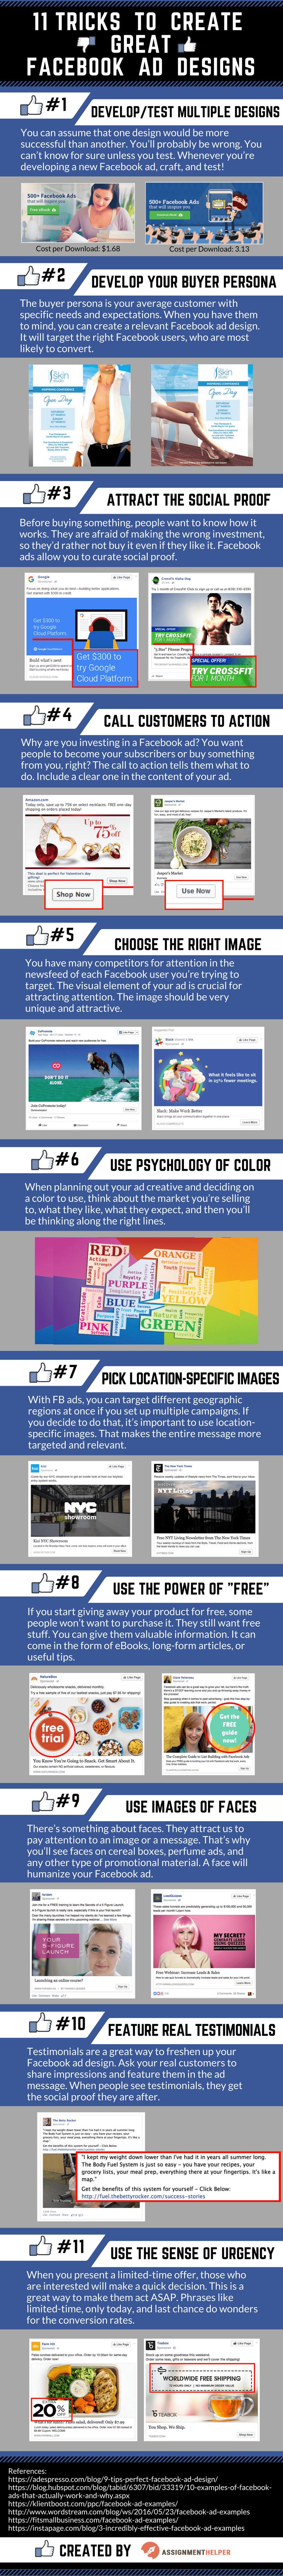 11 Tricks to Create Great Facebook Ad Designs